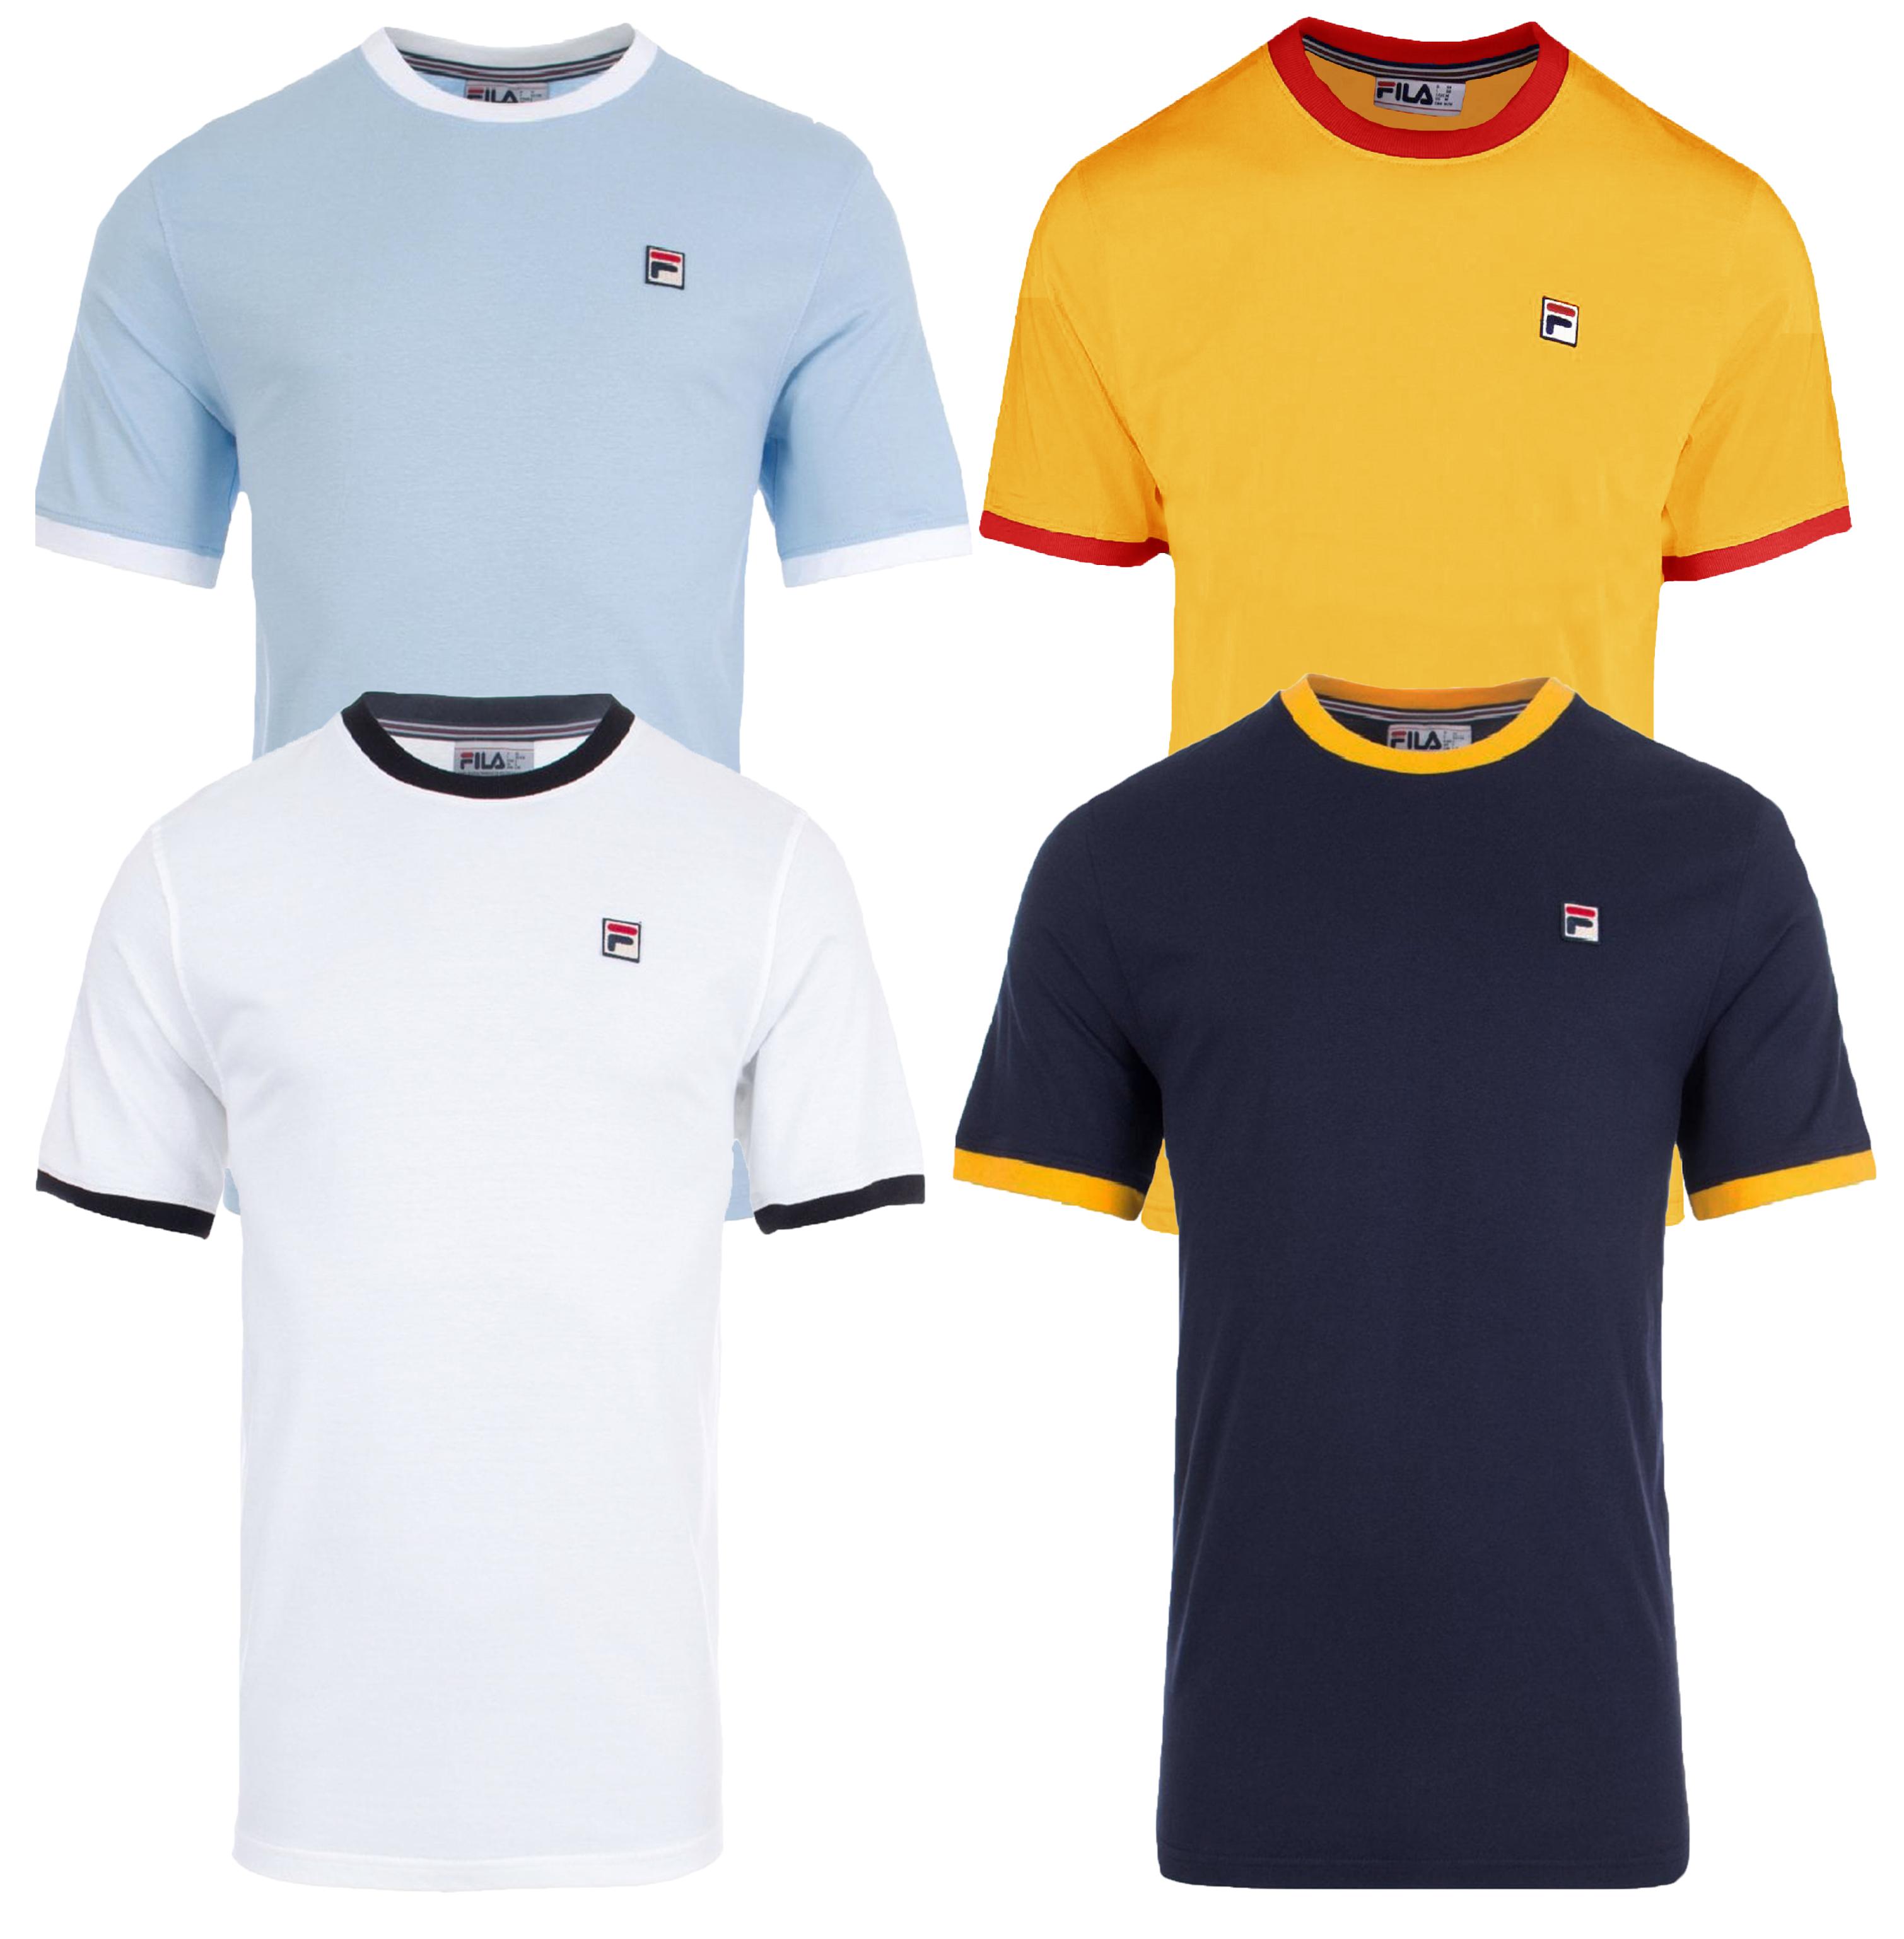 6b7b9560113 Details about FILA Retro Marconi Crew Neck Plain Ringer T-Shirt Sports Top  Casual Tee